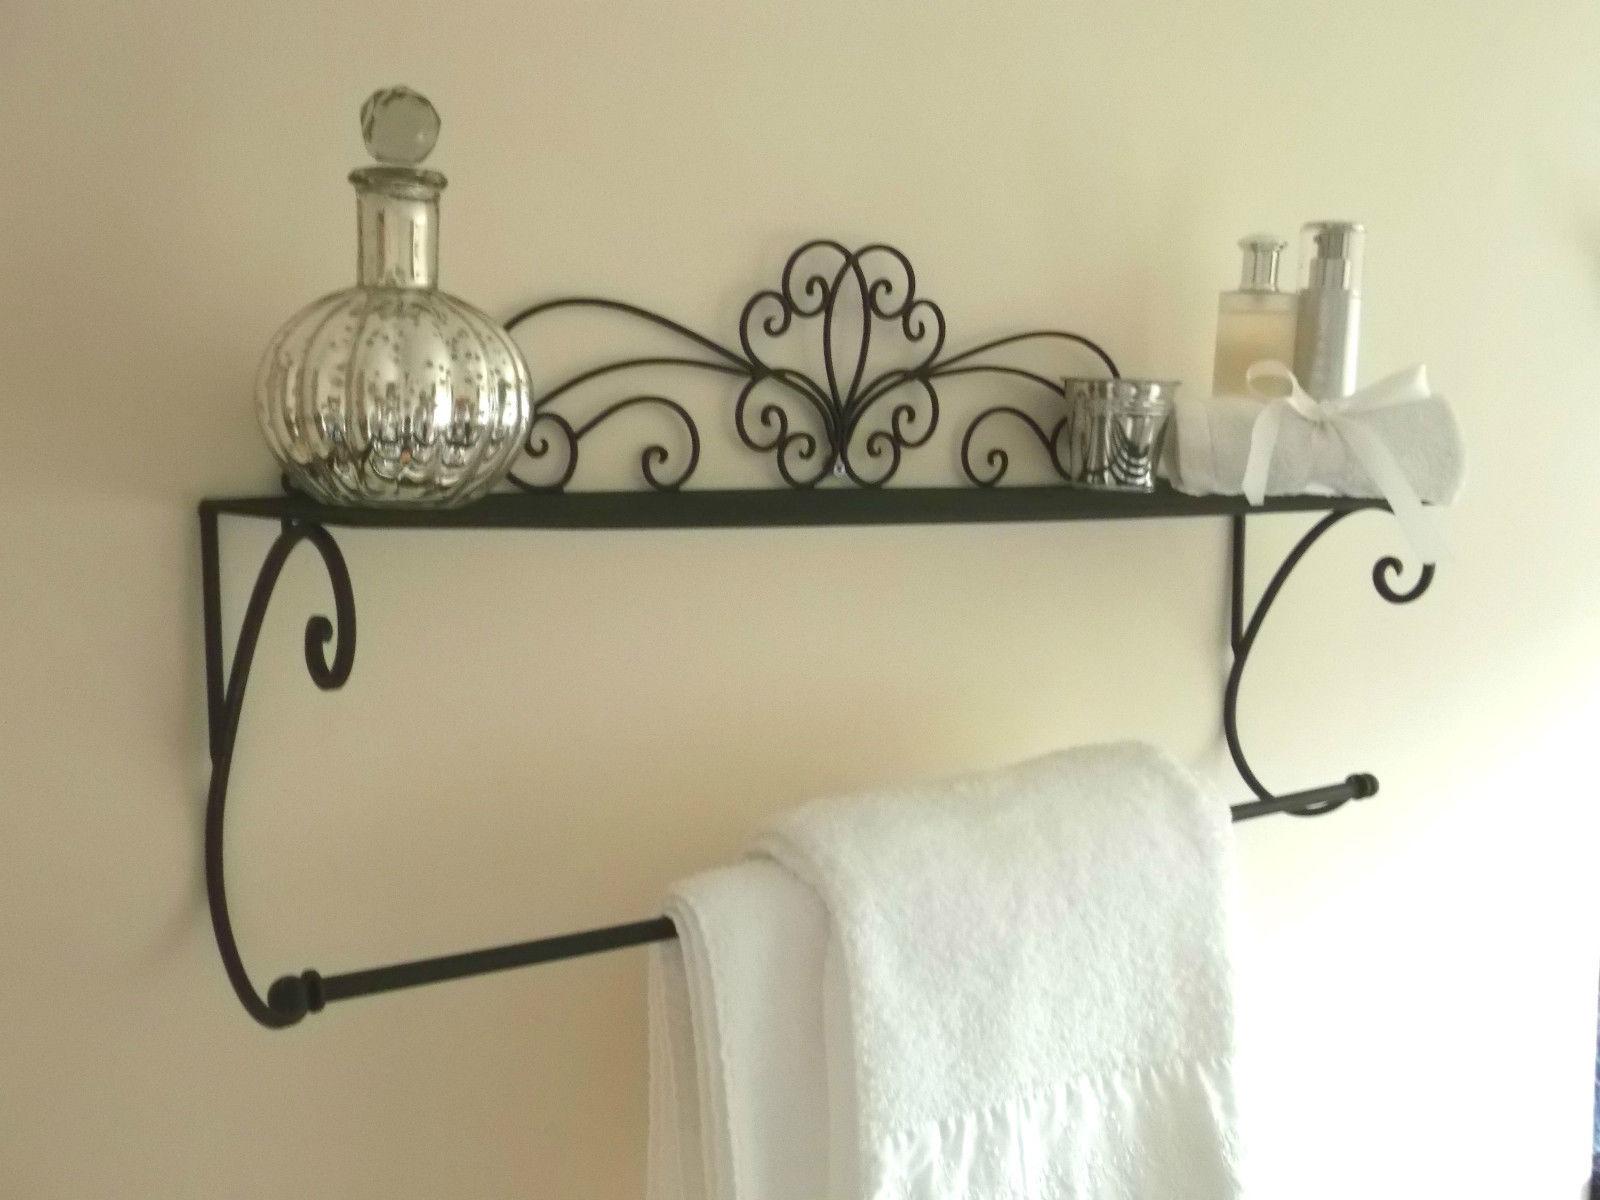 black metal wall mounted towel rail shelf amazing. Black Bedroom Furniture Sets. Home Design Ideas